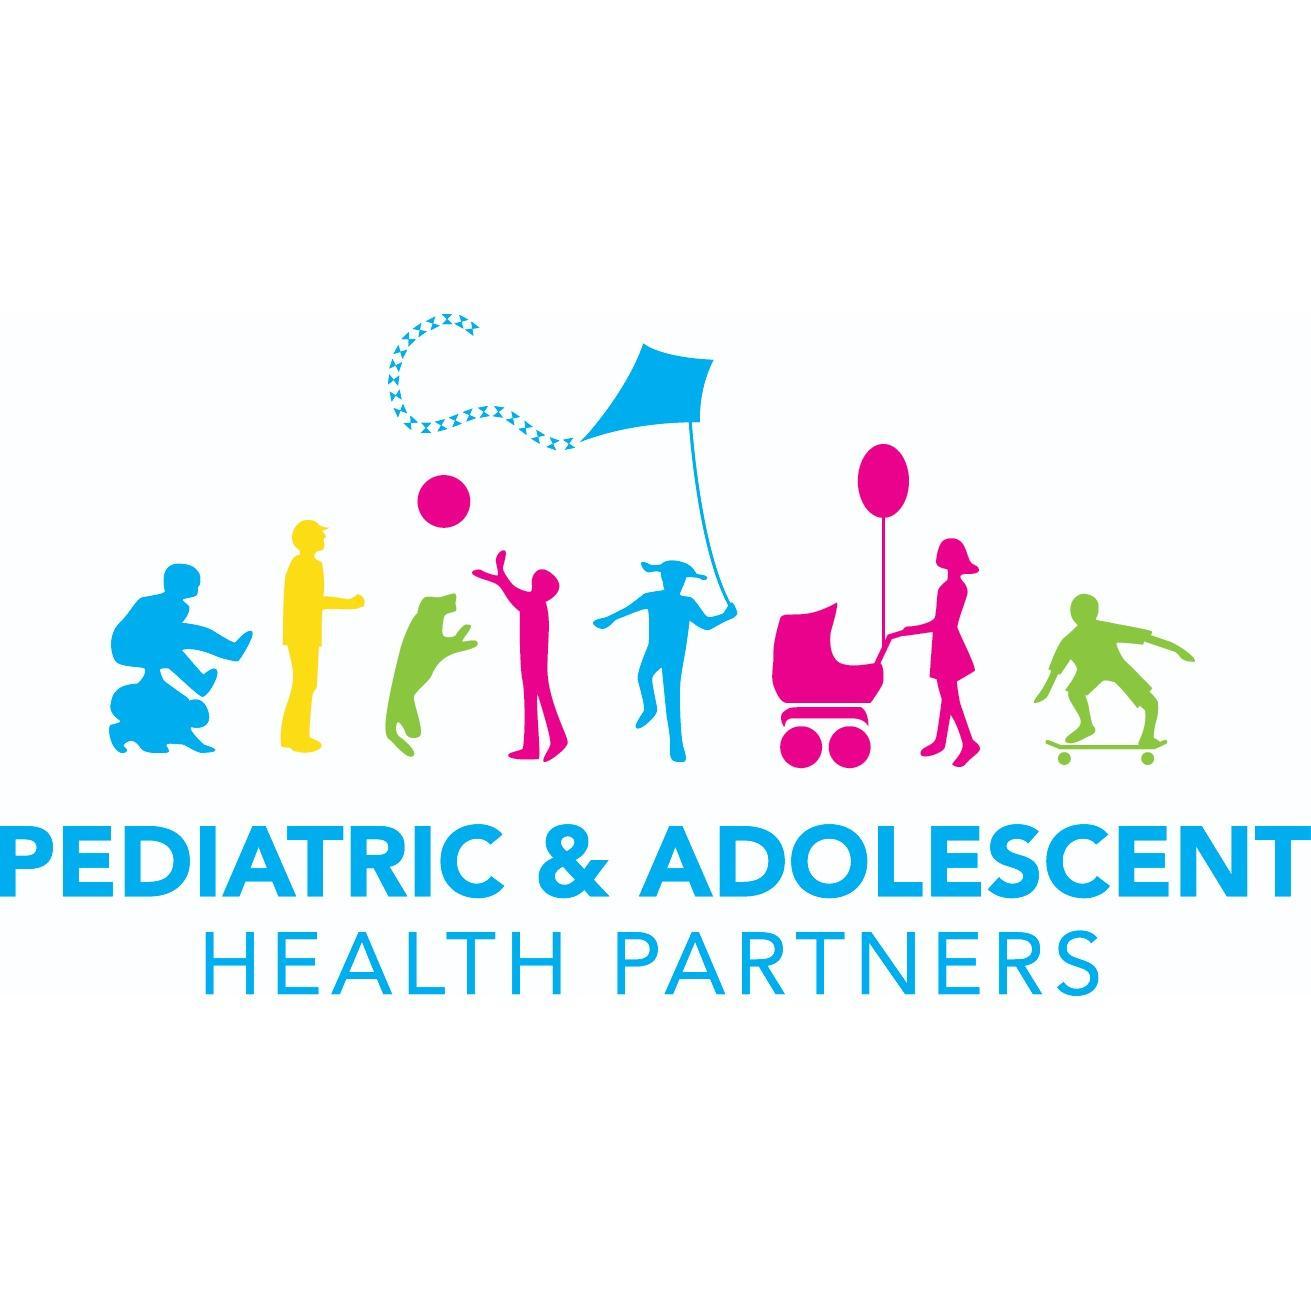 Pediatric & Adolescent Health Partners - Powhatan Office - Powhatan, VA - General or Family Practice Physicians